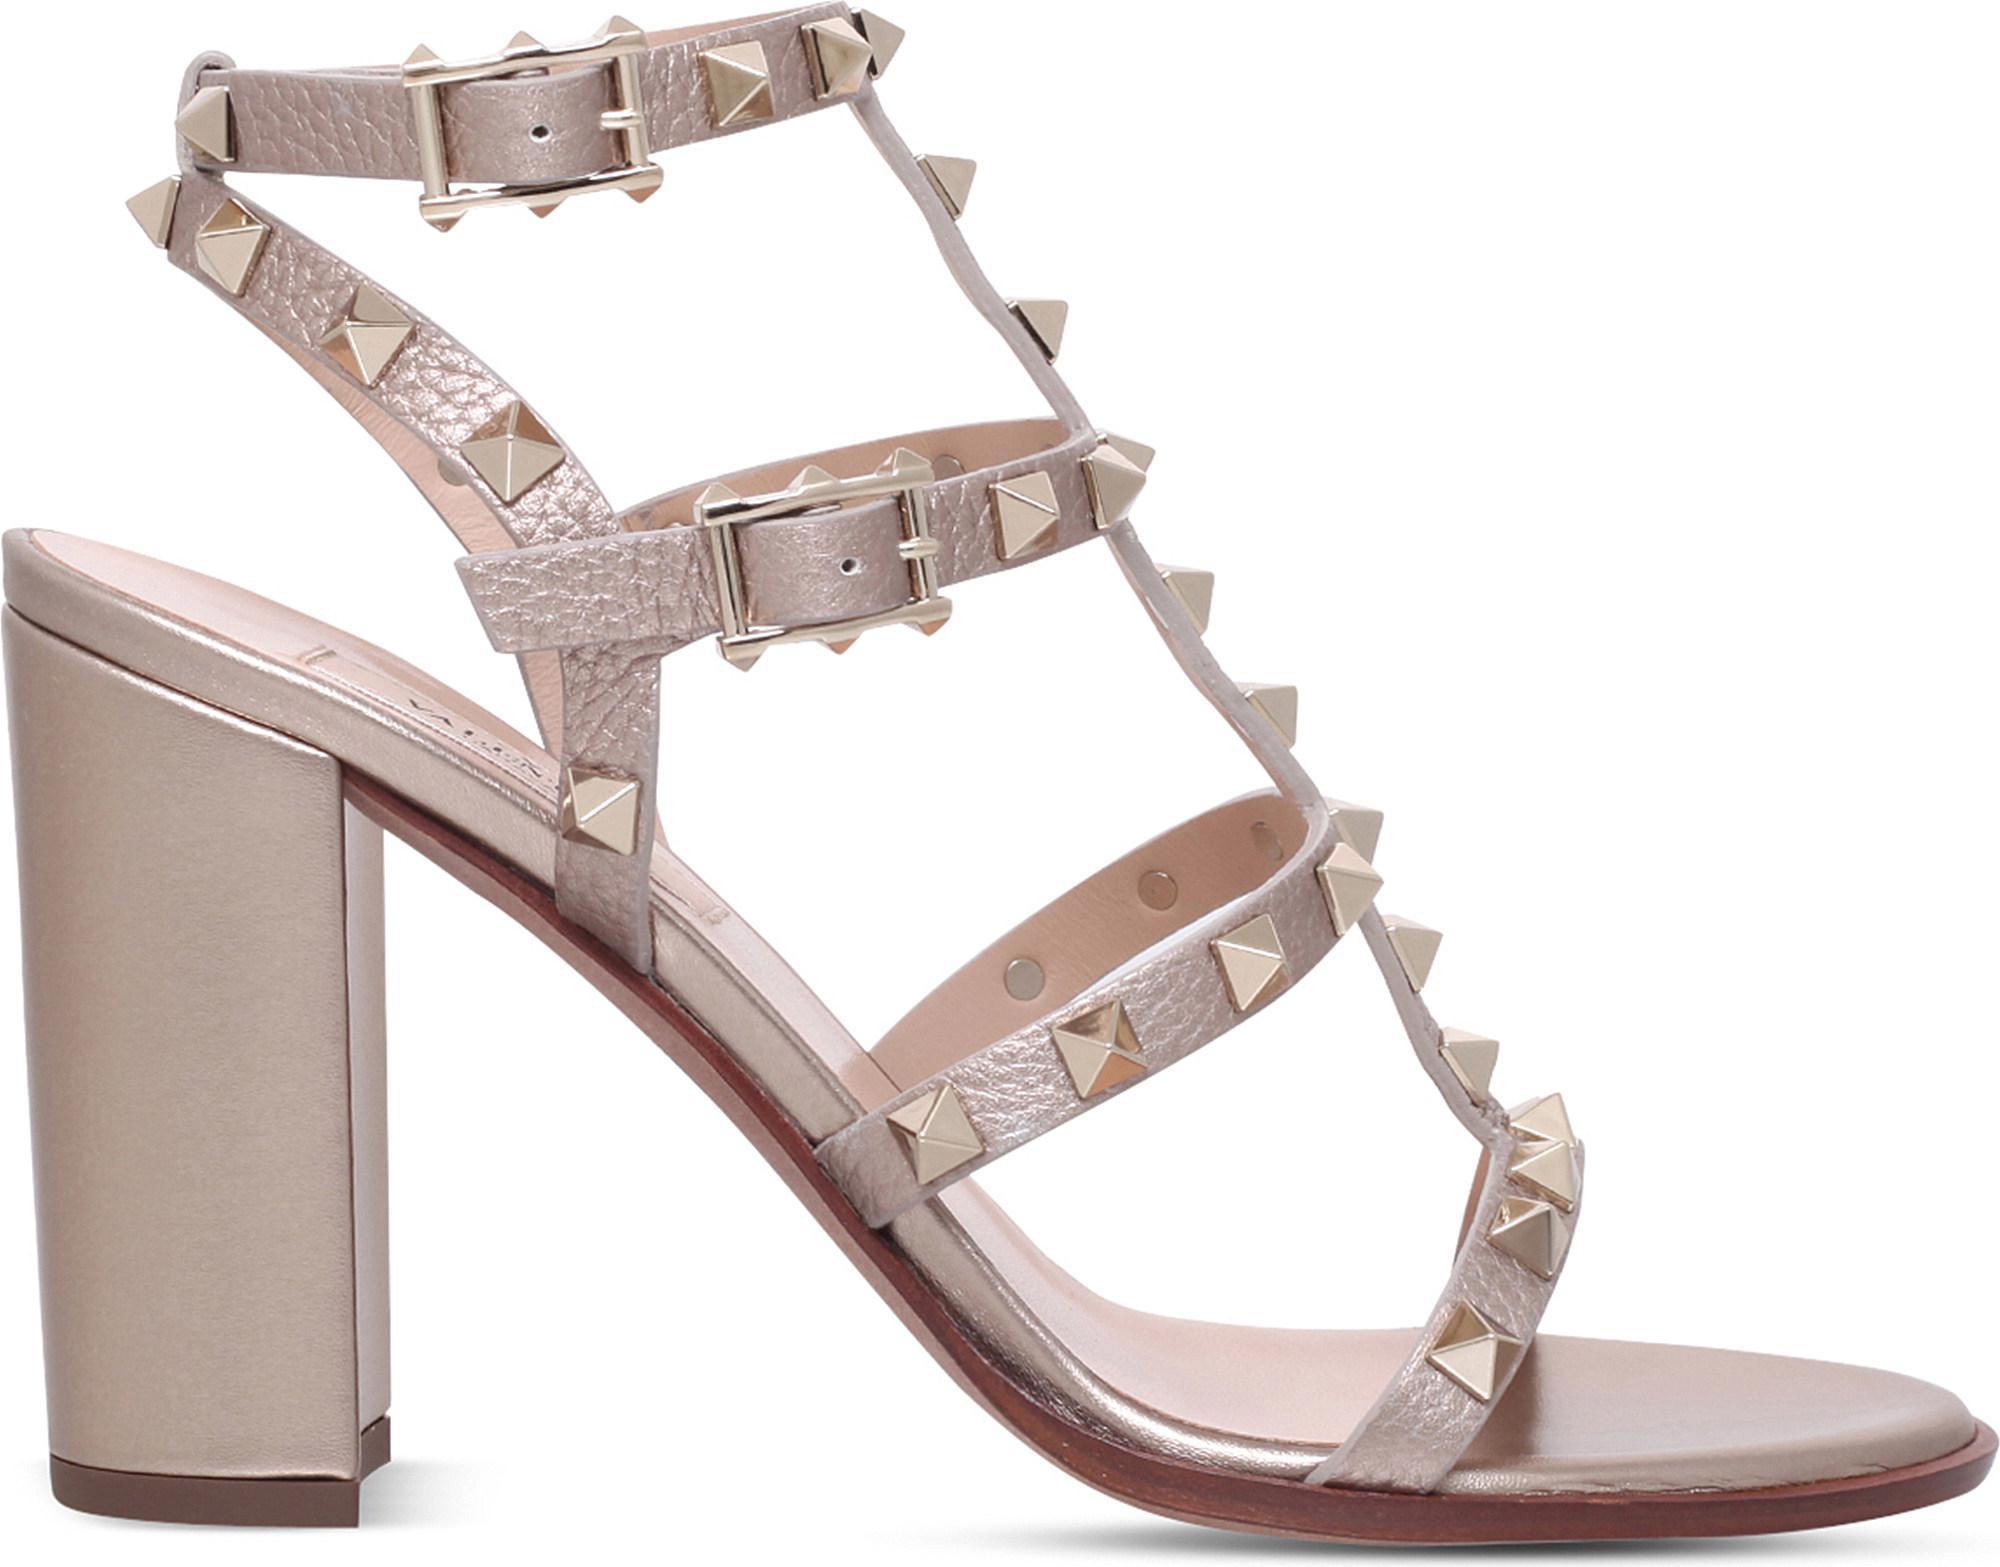 1408c0695fbd0 Lyst - Valentino Rockstud 90 Leather Heeled Sandals in Metallic